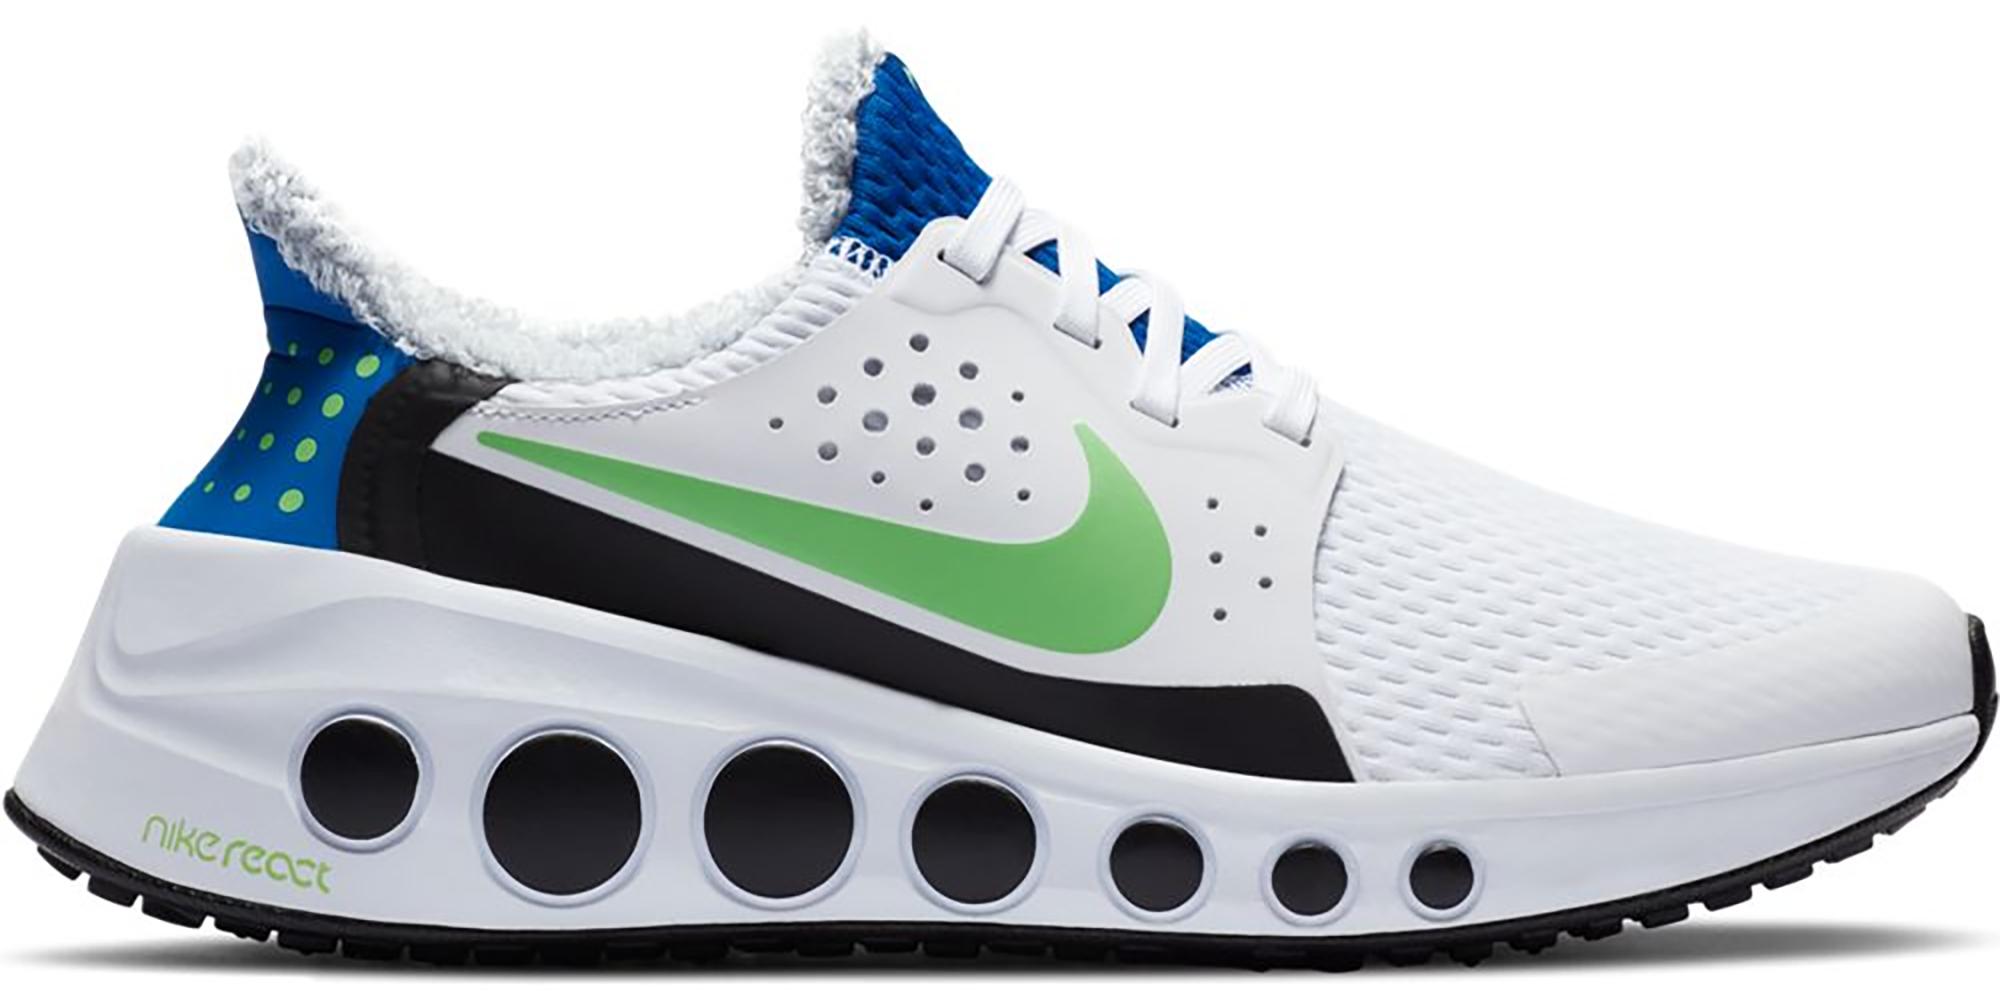 Nike CruzrOne Scream Green